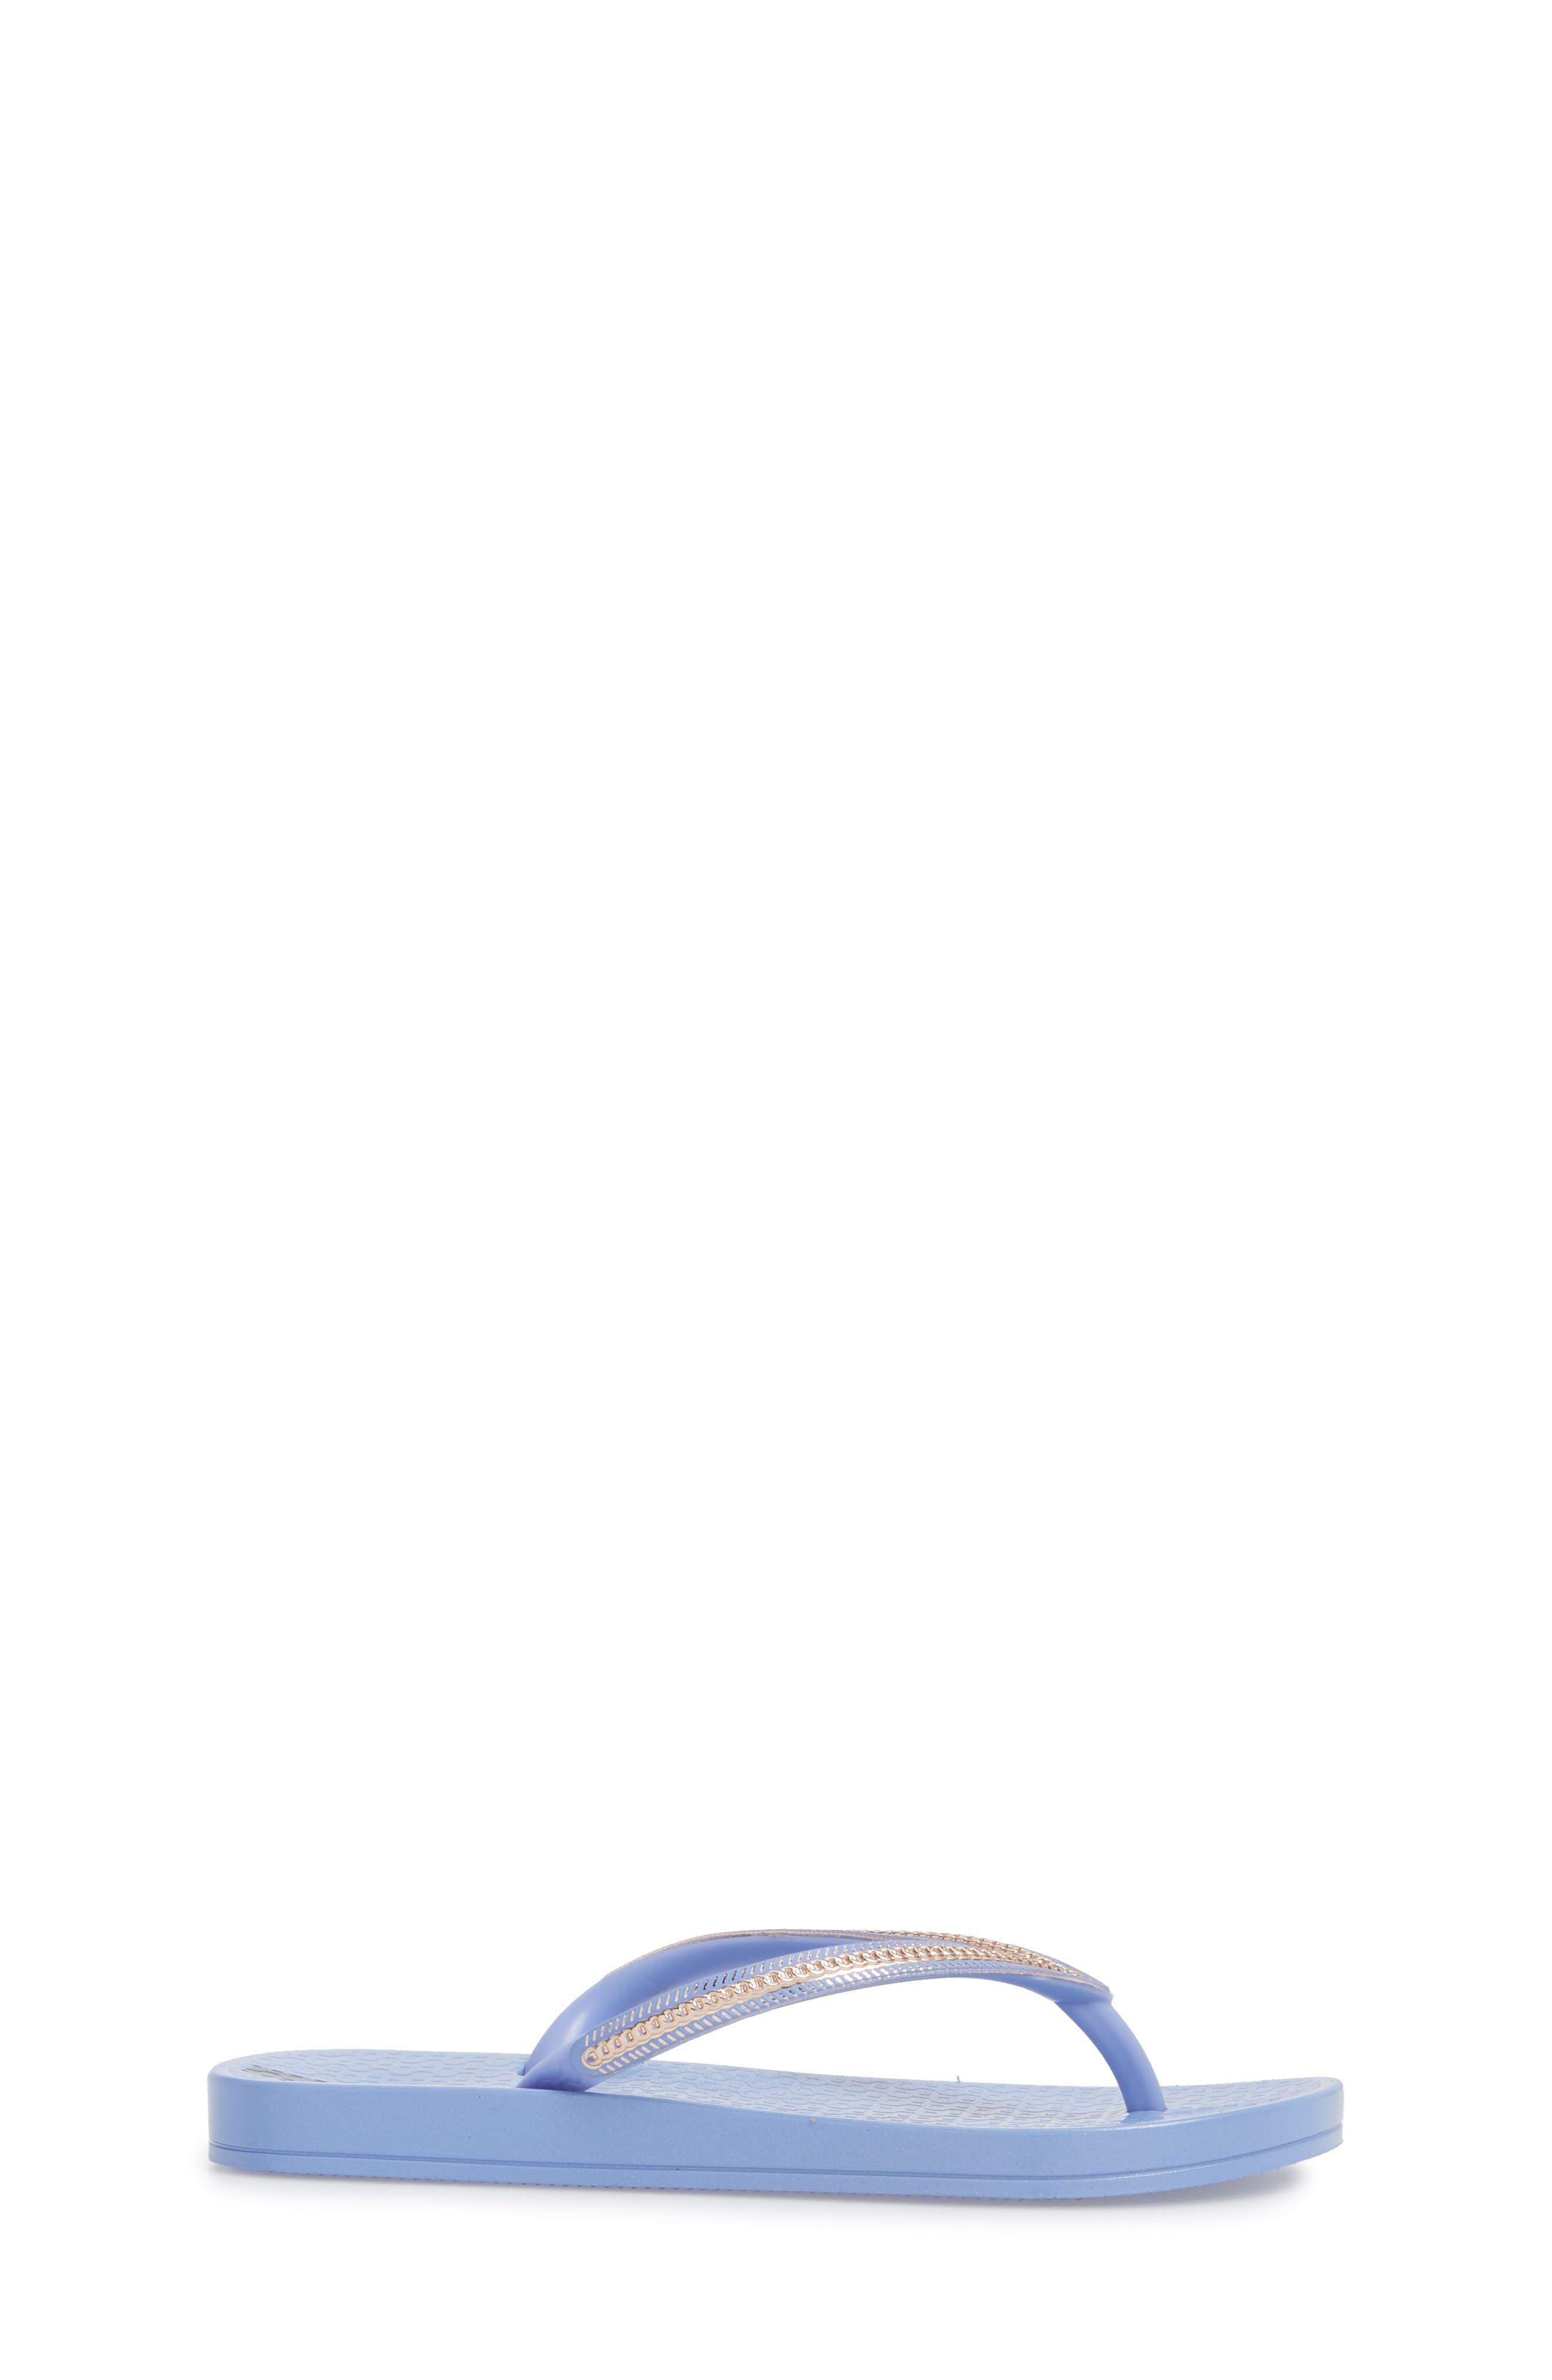 Ana Metallic Flip Flop,                             Alternate thumbnail 3, color,                             500